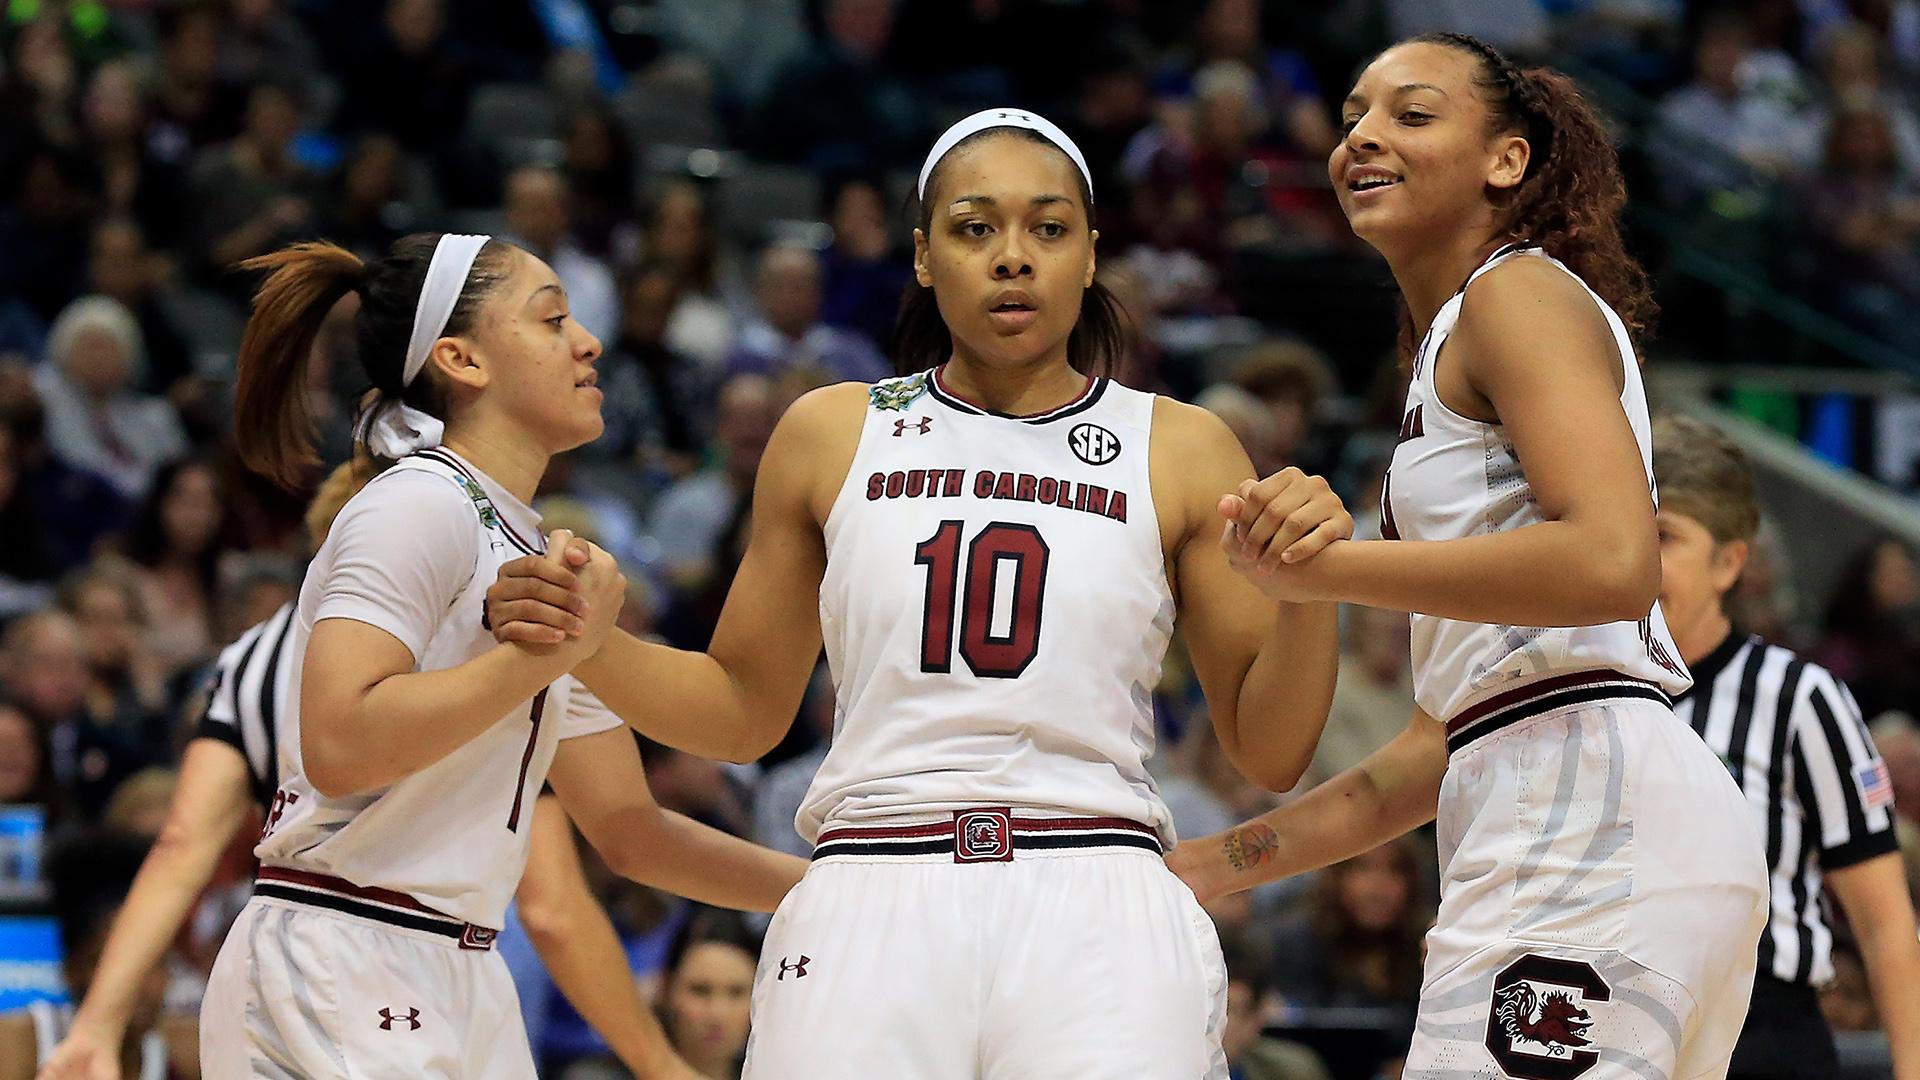 est womens basketball title - HD1920×1080